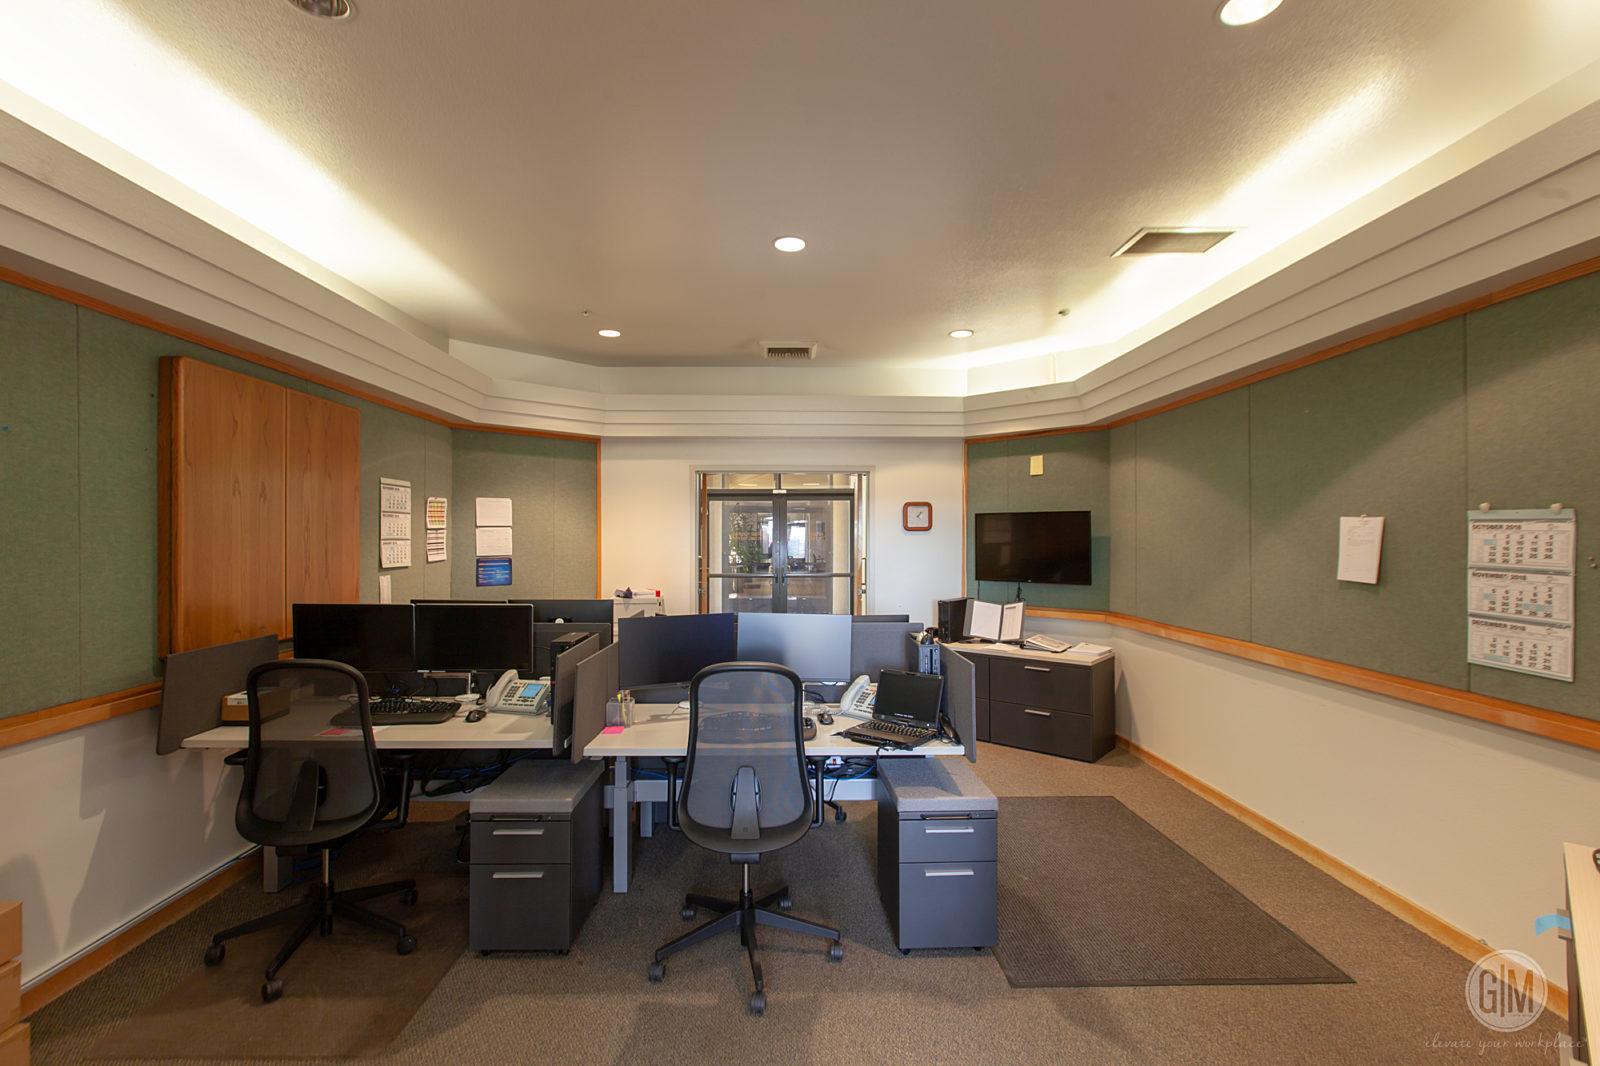 COSB Coroner's Office Team Office Makeover